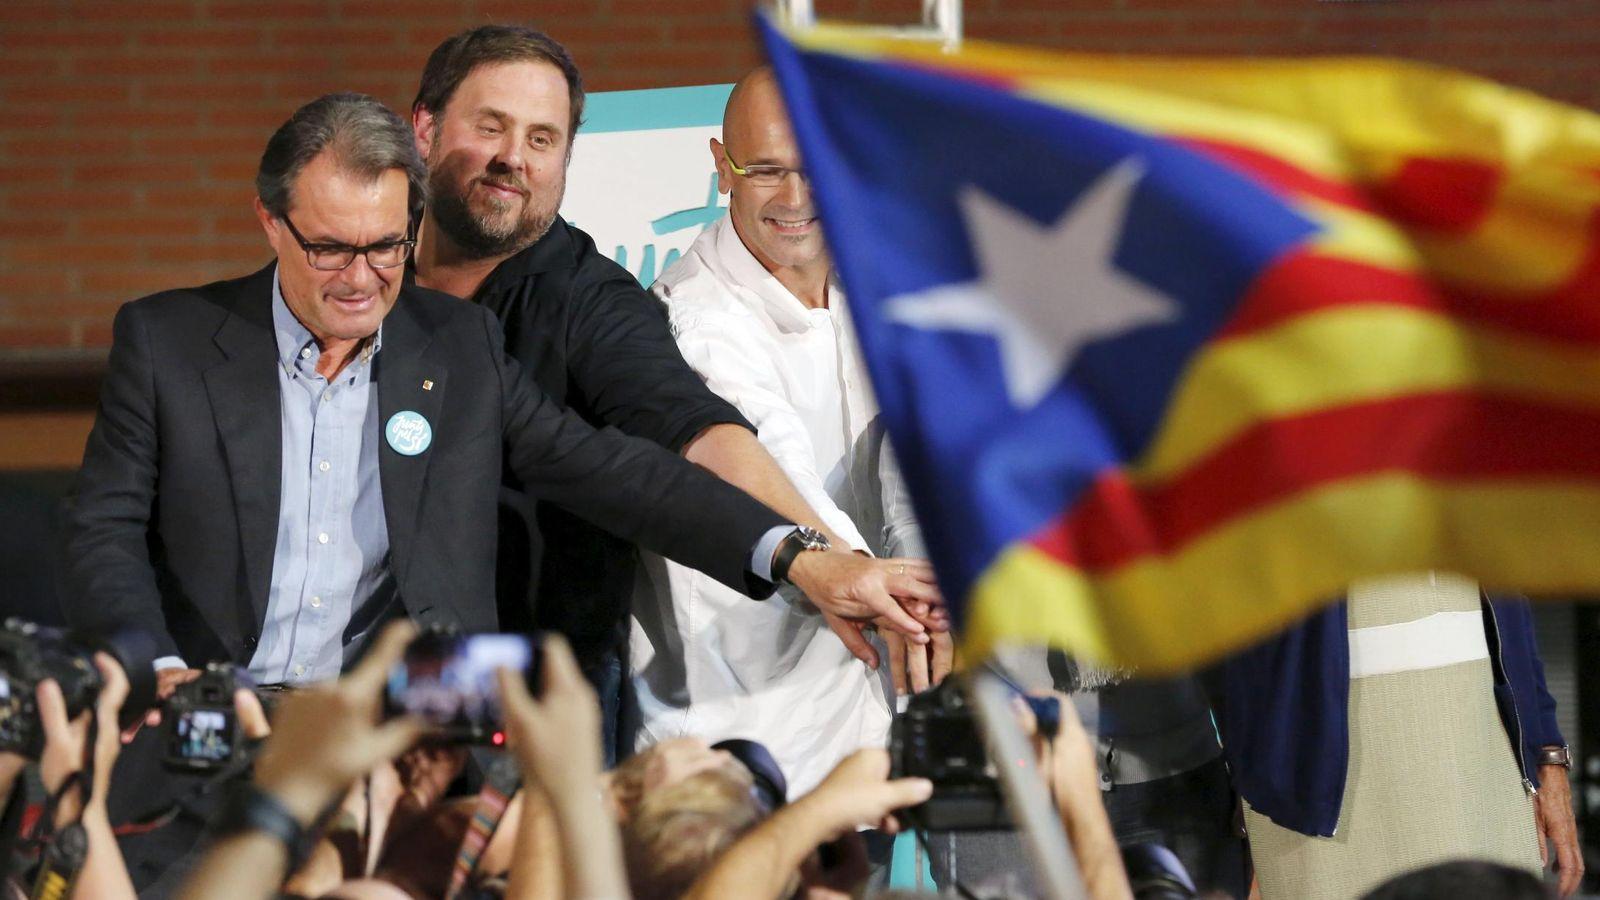 Foto: Artur Mas, Oriol Junqueras y Raül Romeva en el mitin de apertura de la campaña electoral. (Reuters)